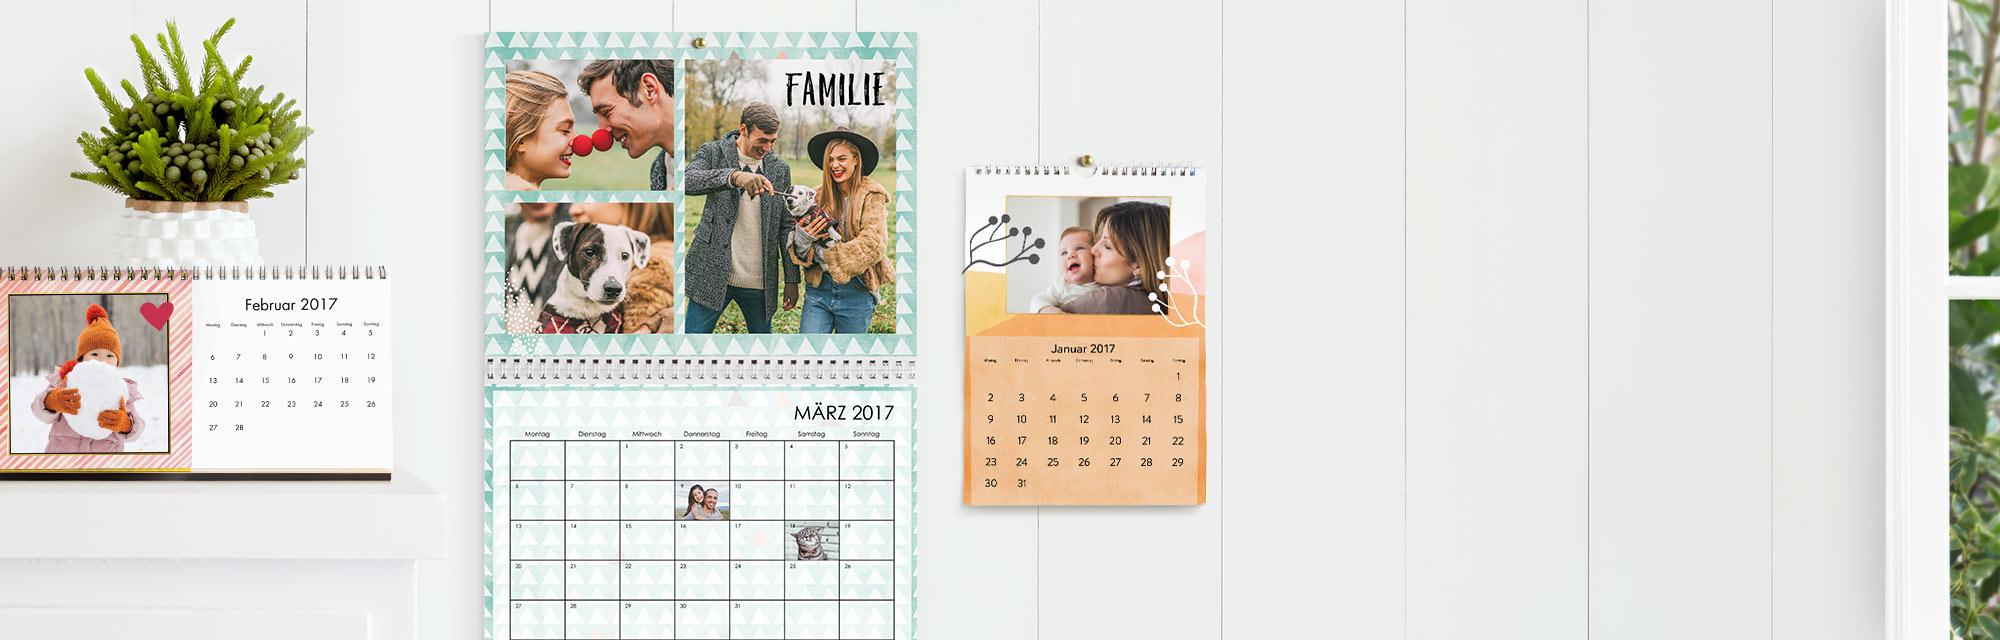 Fotokalender  : Individuelle Fotokalender - Ihre Lieblingsfotos immer im Blick